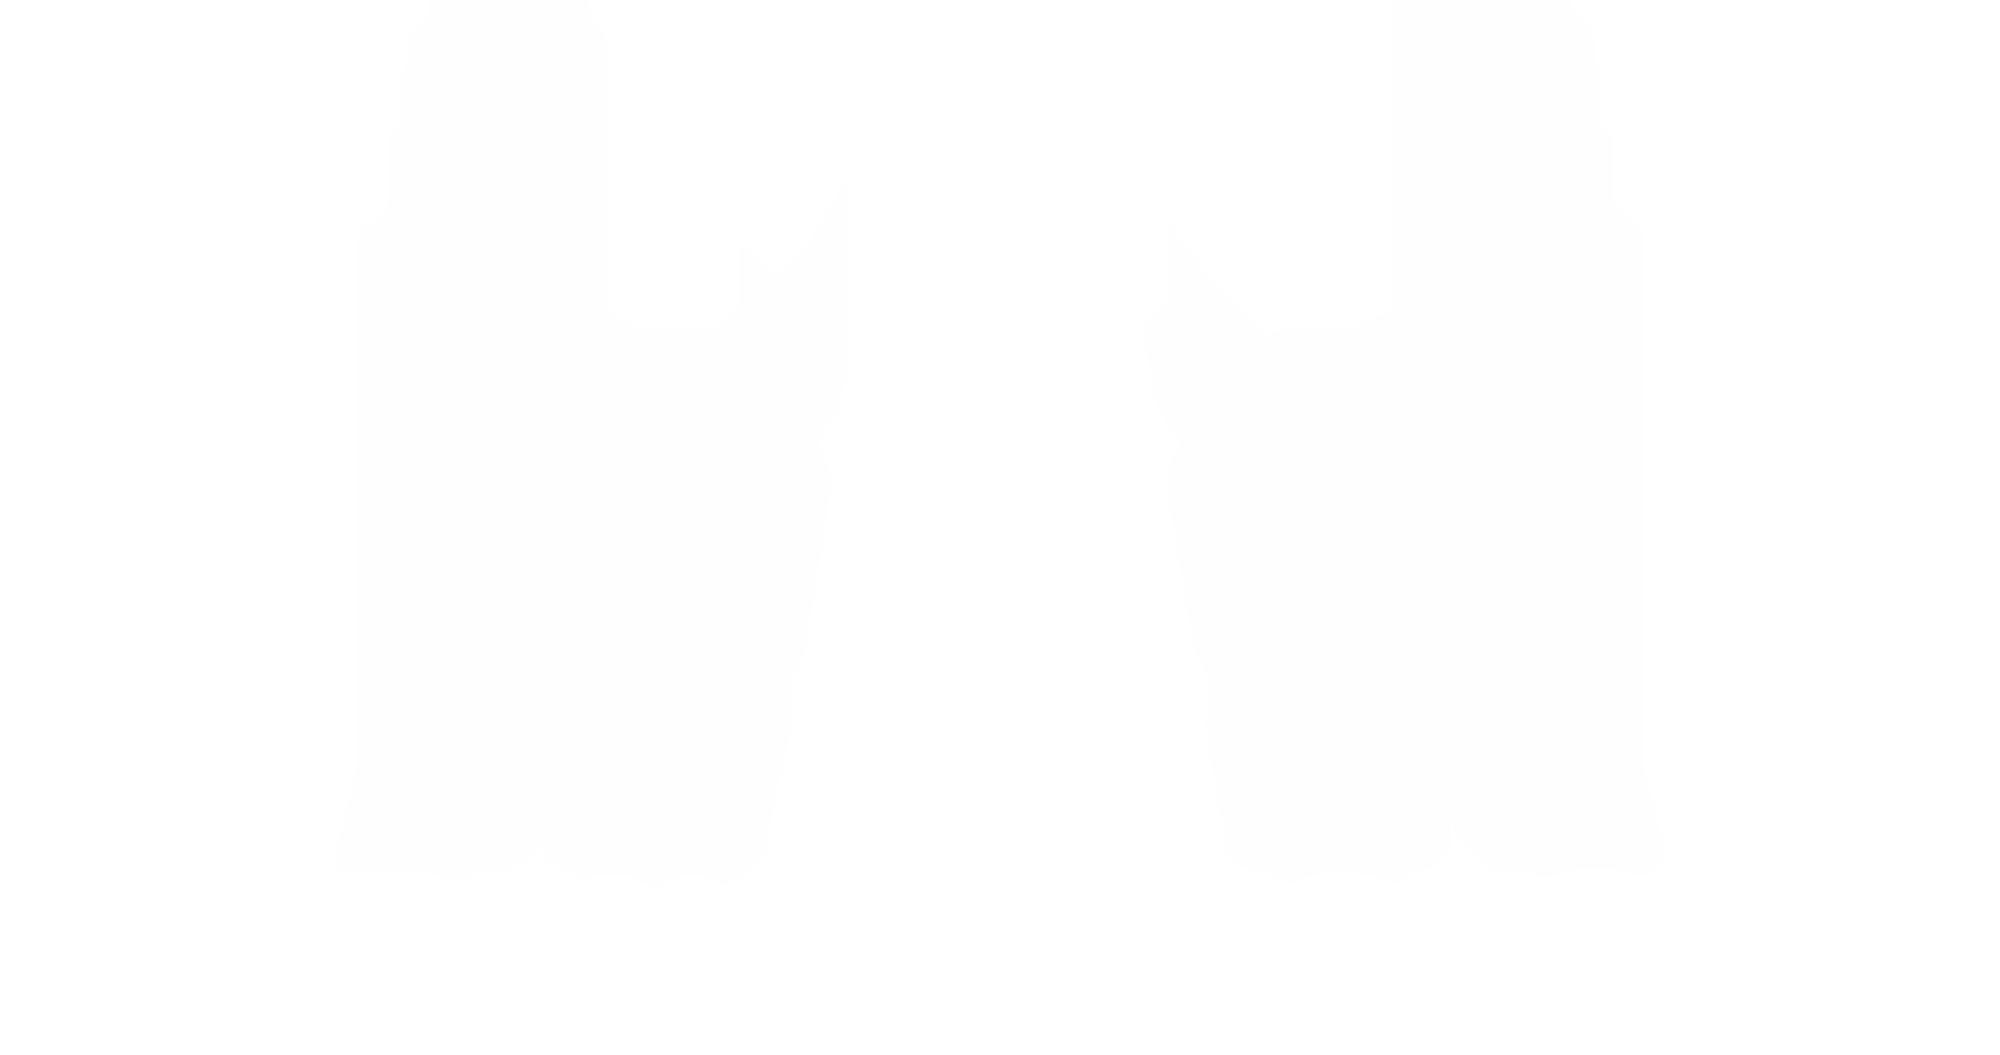 MK Renovations